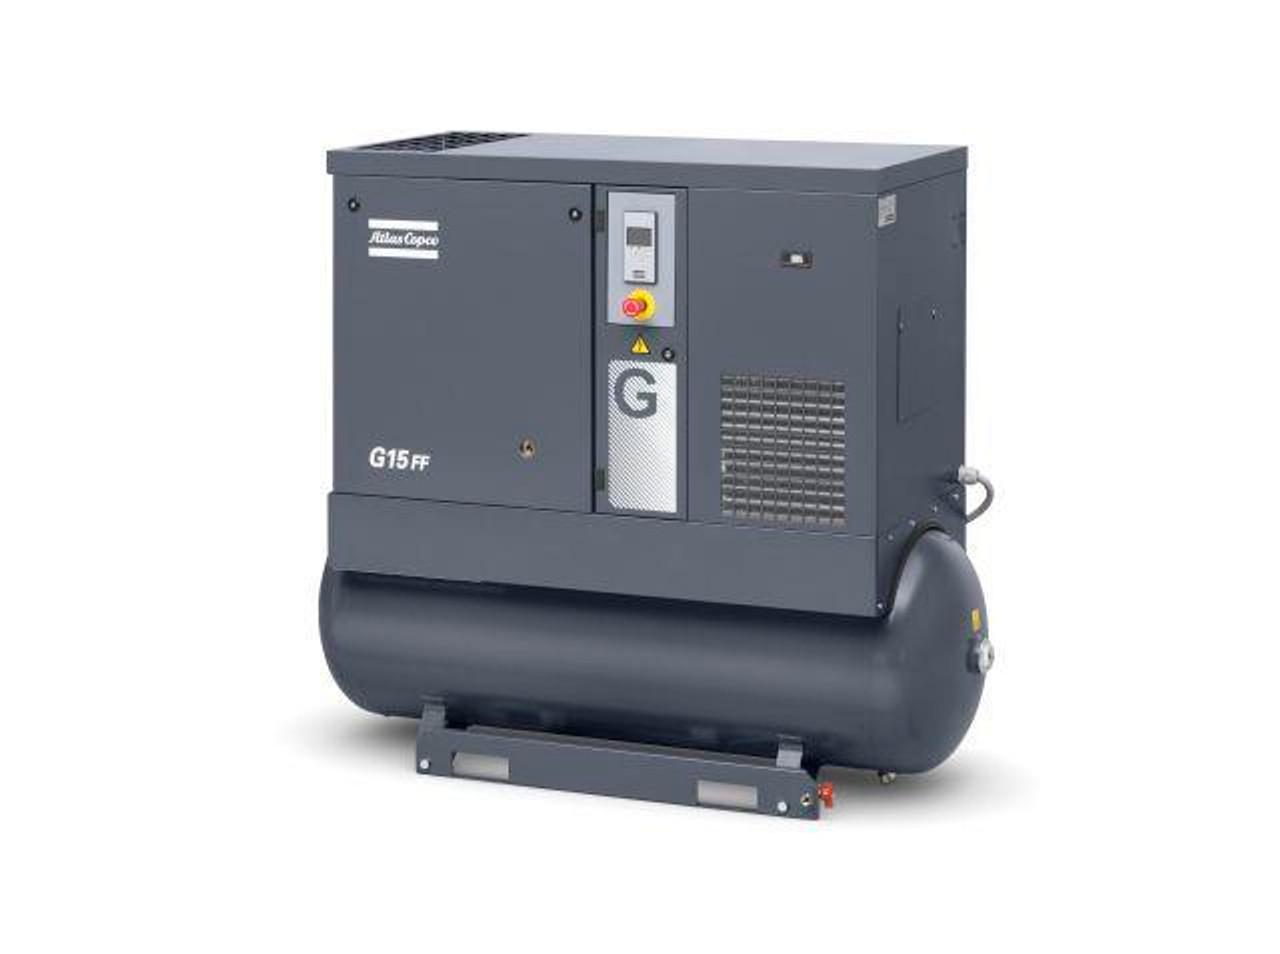 Atlas Copco Screw Compressor - G18FF - 25HP 92.1 CFM